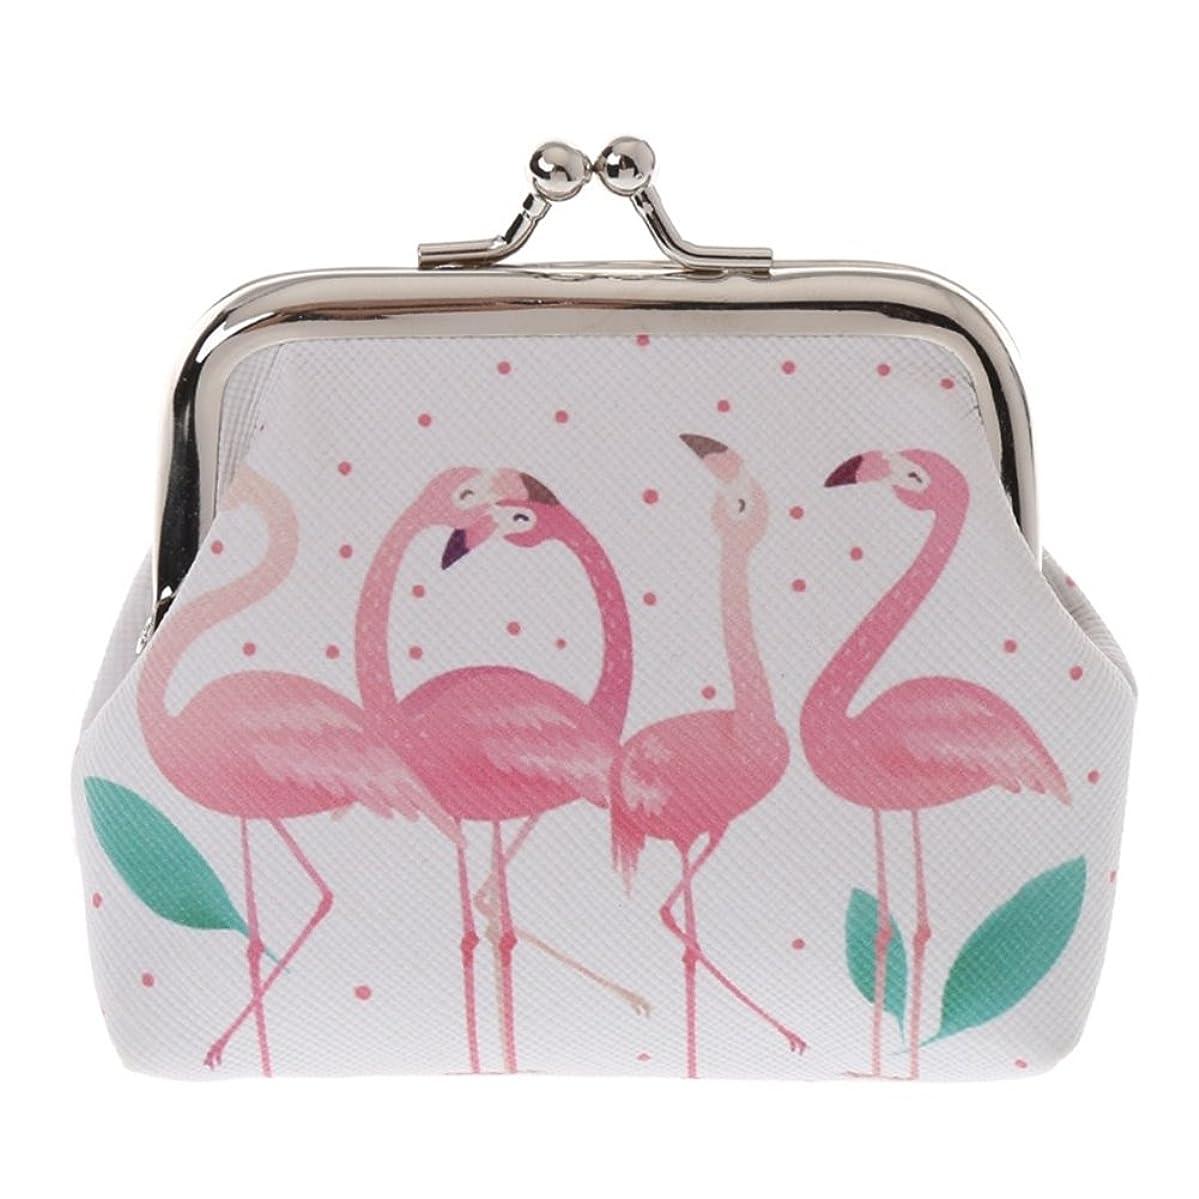 Aland Cartoon Flamingo Faux Leather Coin Purse Bag Earphone Key Case Women Mini Wallet 4#